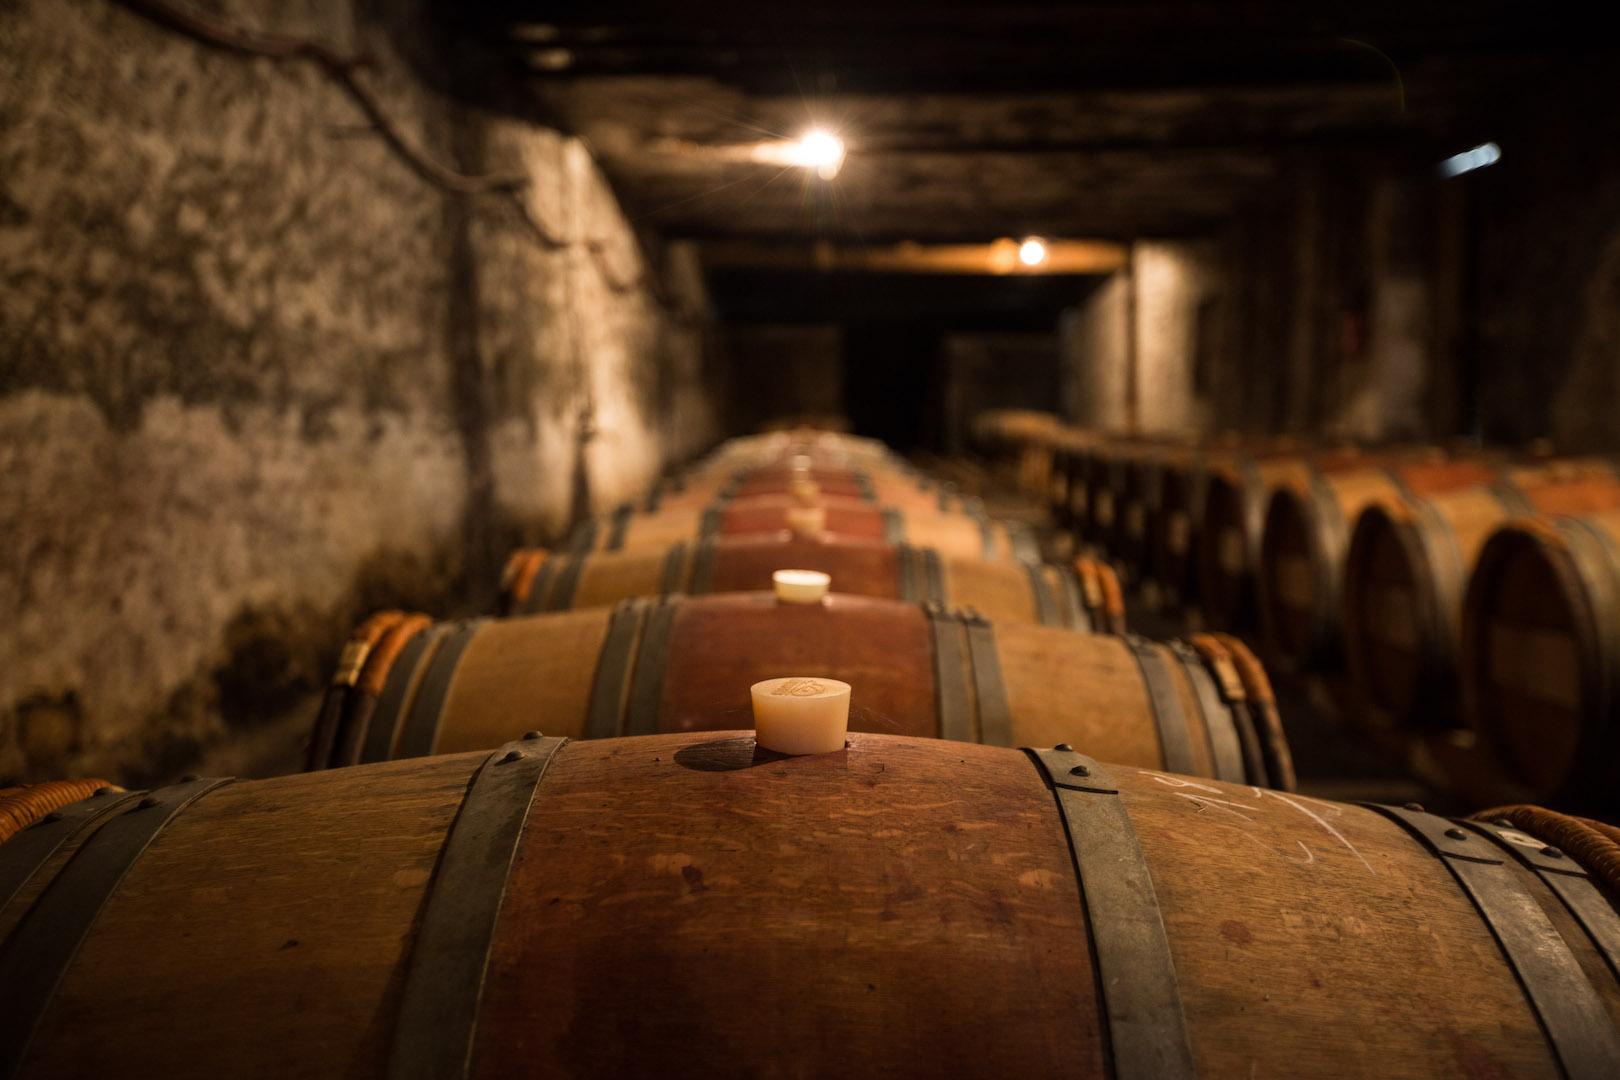 chateau-des-arras-prestige-cellar-barrels-bordaeux-red-wine